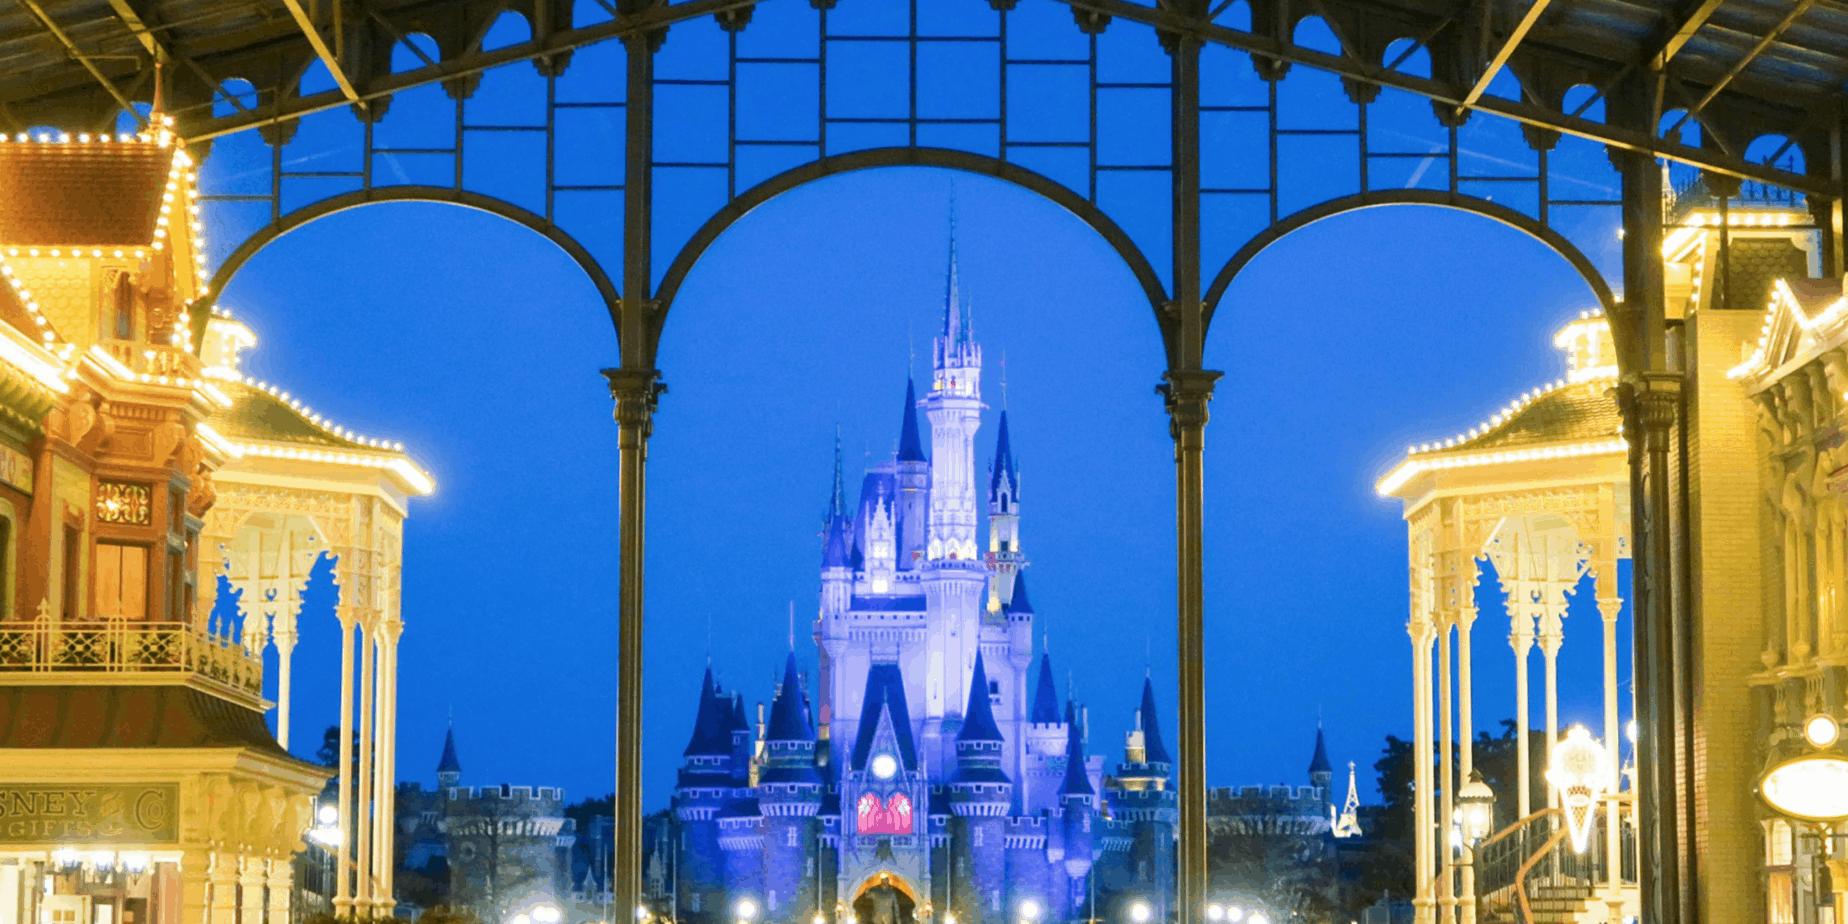 Our Best Tokyo Disneyland Trip Planning Articles